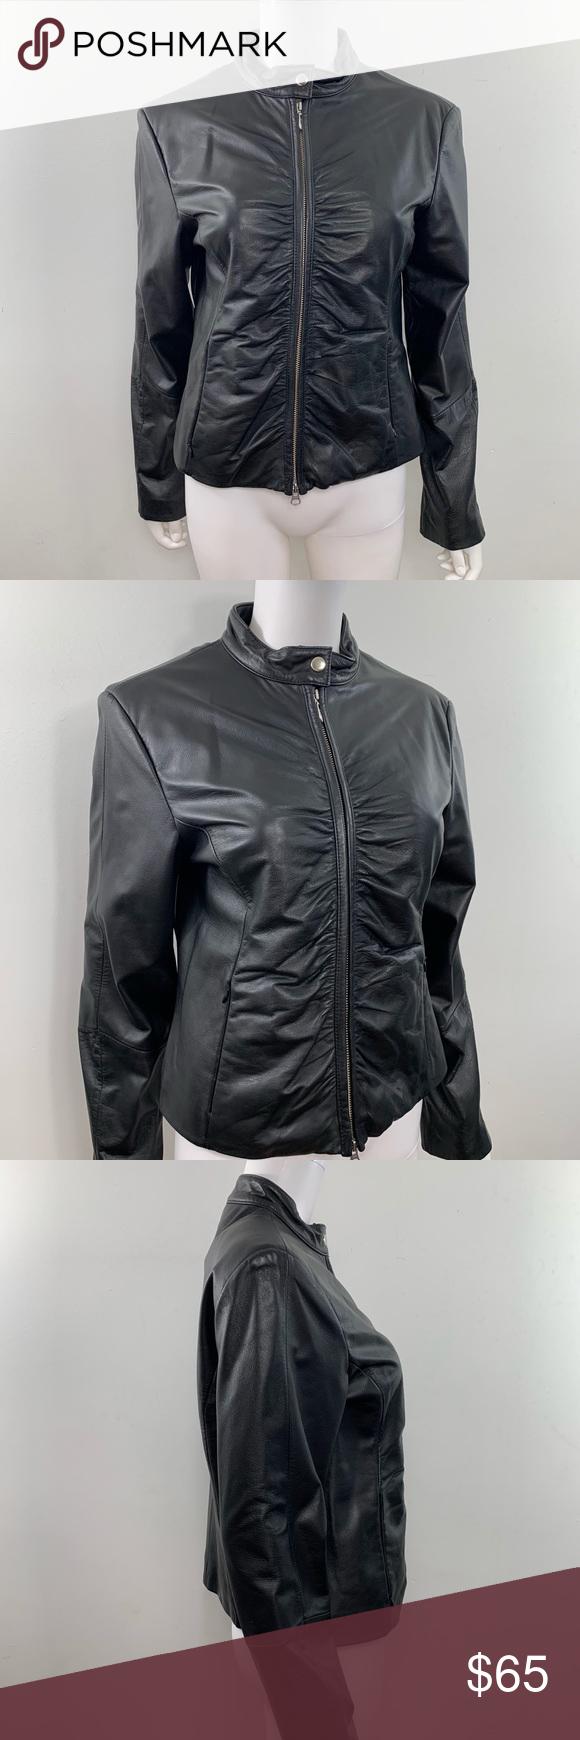 Wilson leather maxima Women's leather jacket Leather